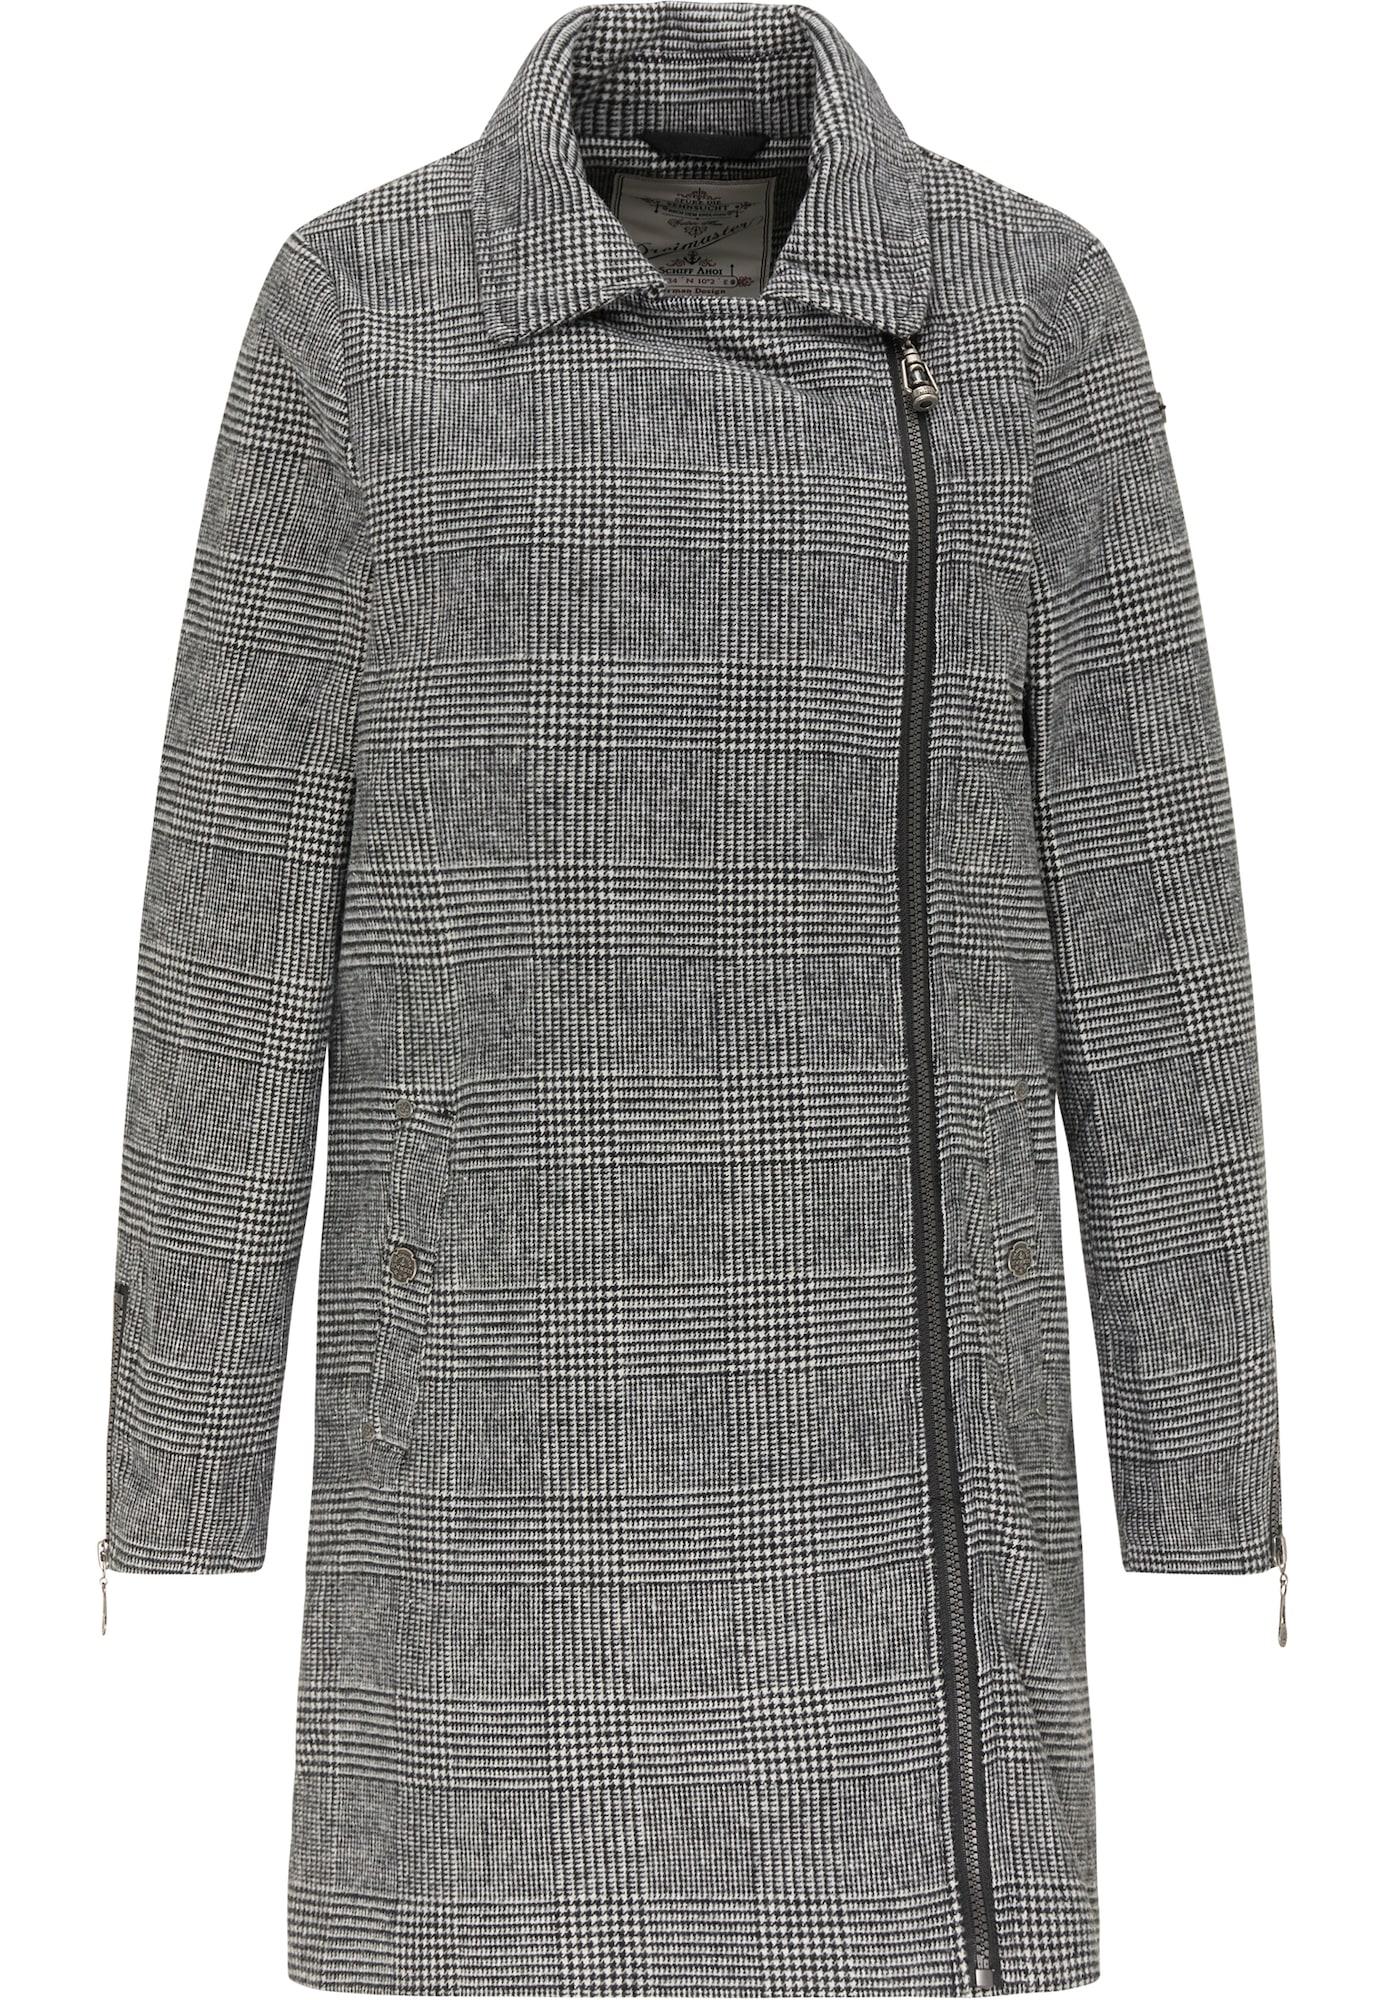 DreiMaster Vintage Žieminis paltas pilka / balta